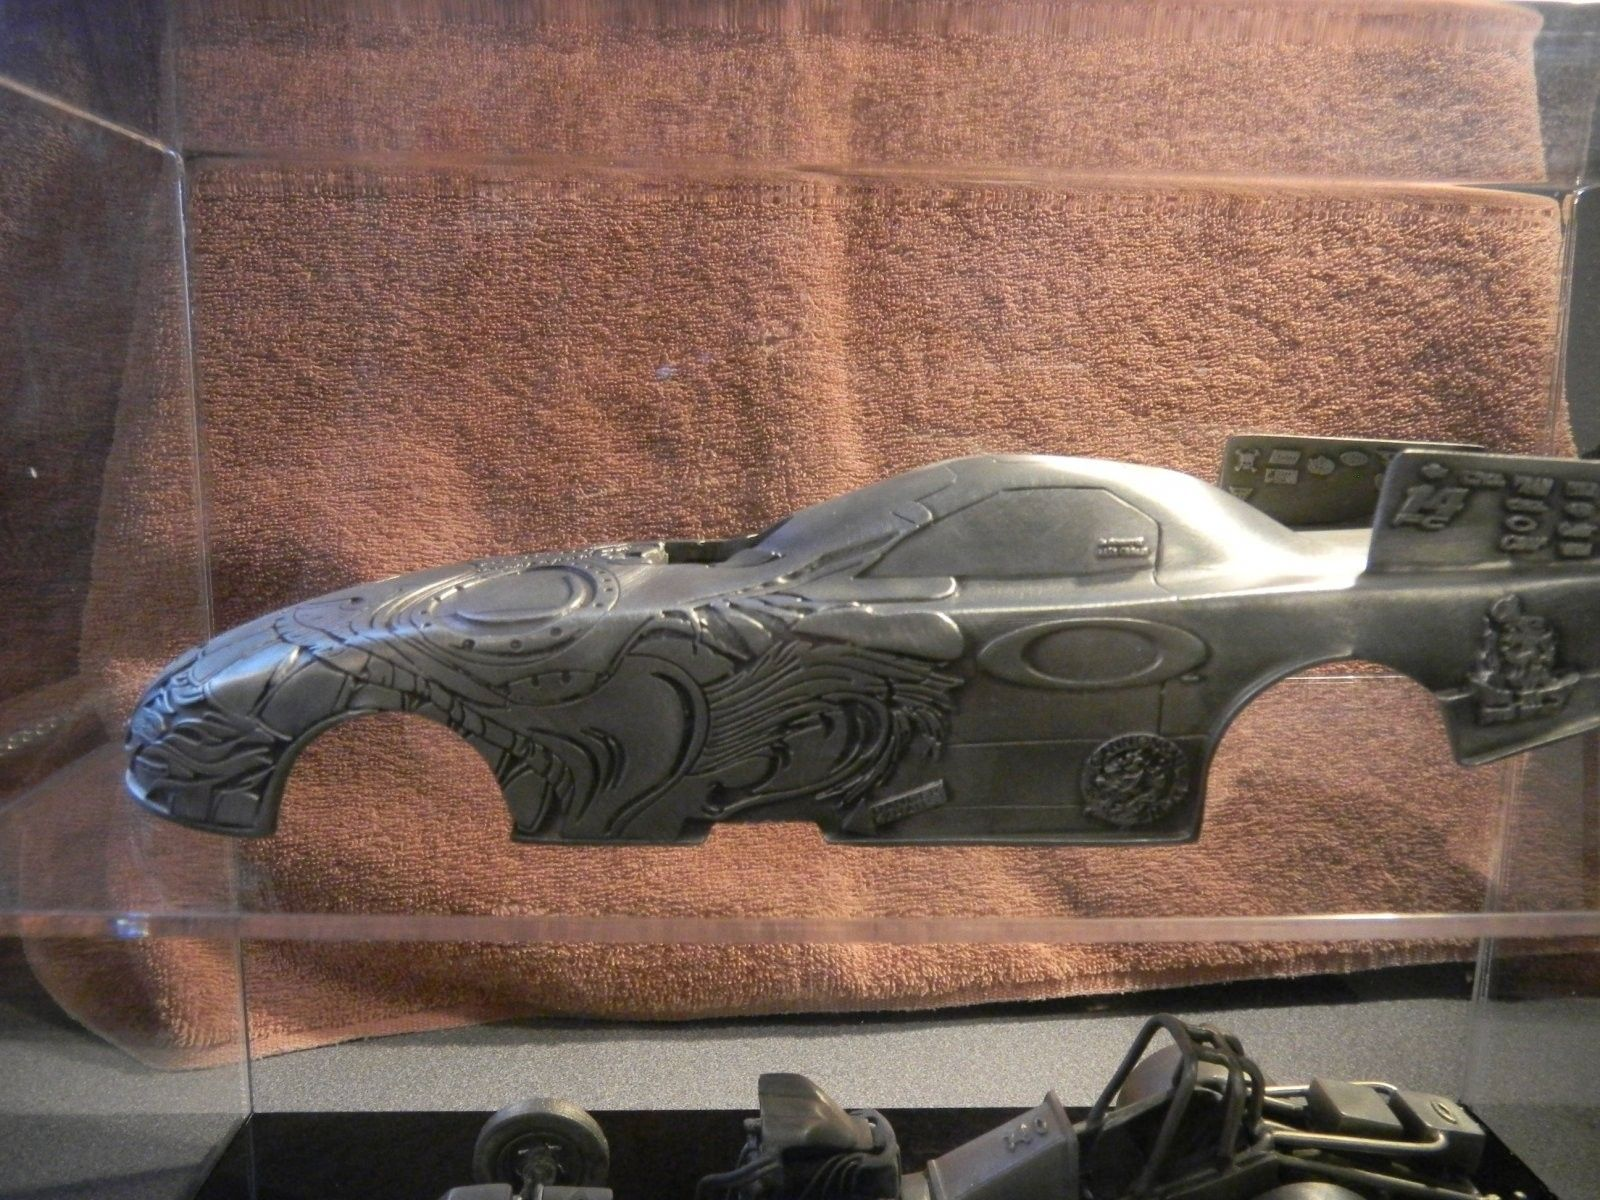 Scotty Cannon PEWTER Funny Car - DSCN1868.JPG